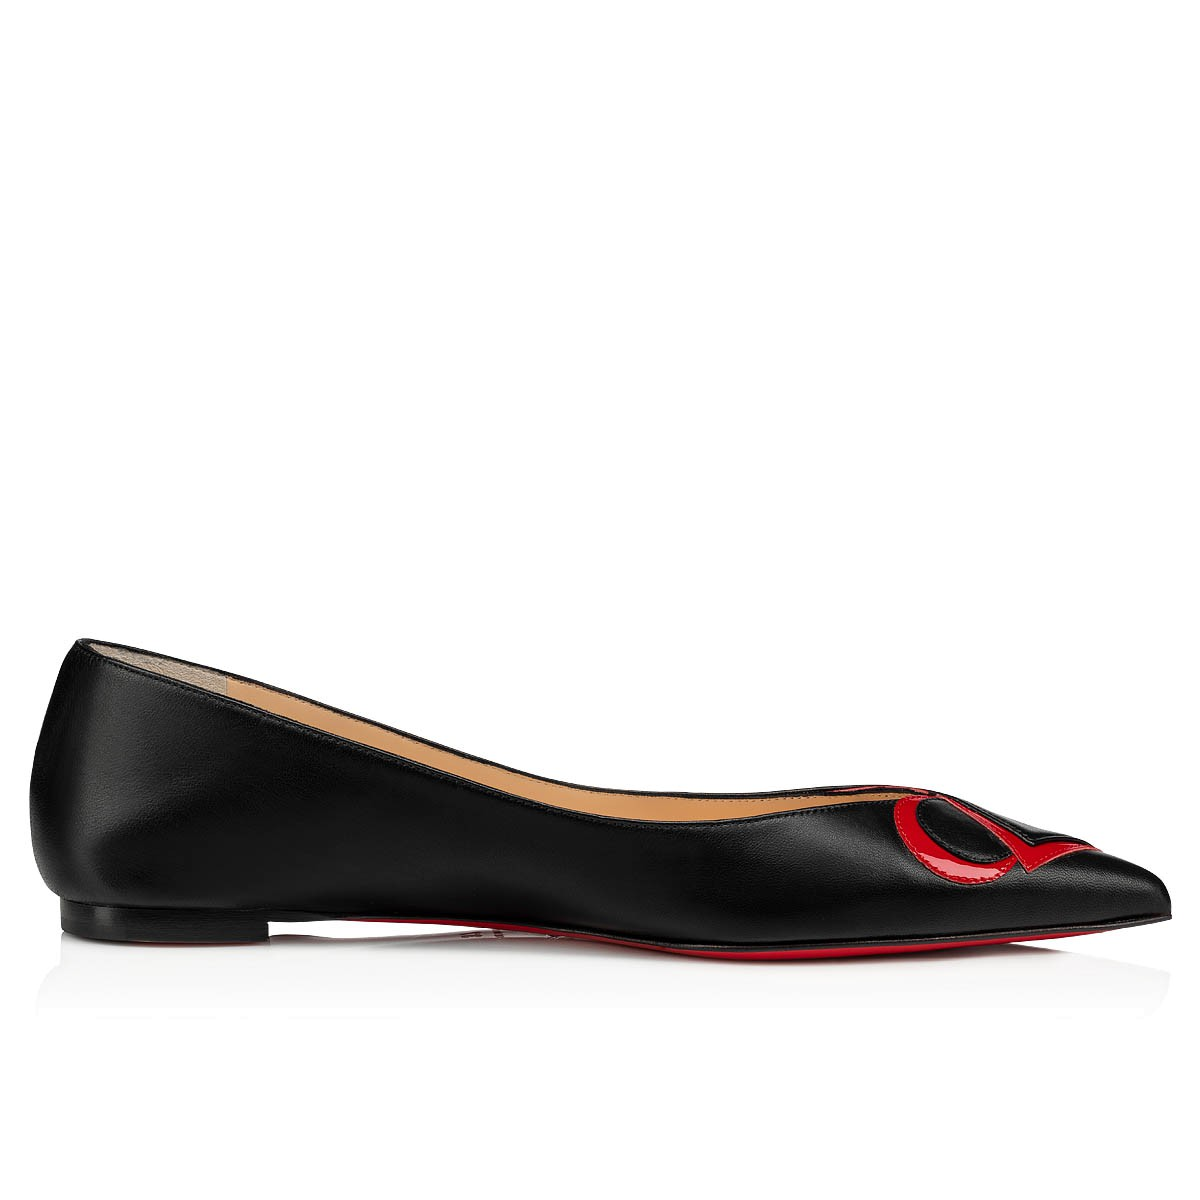 Shoes - Cl Pump Flat - Christian Louboutin